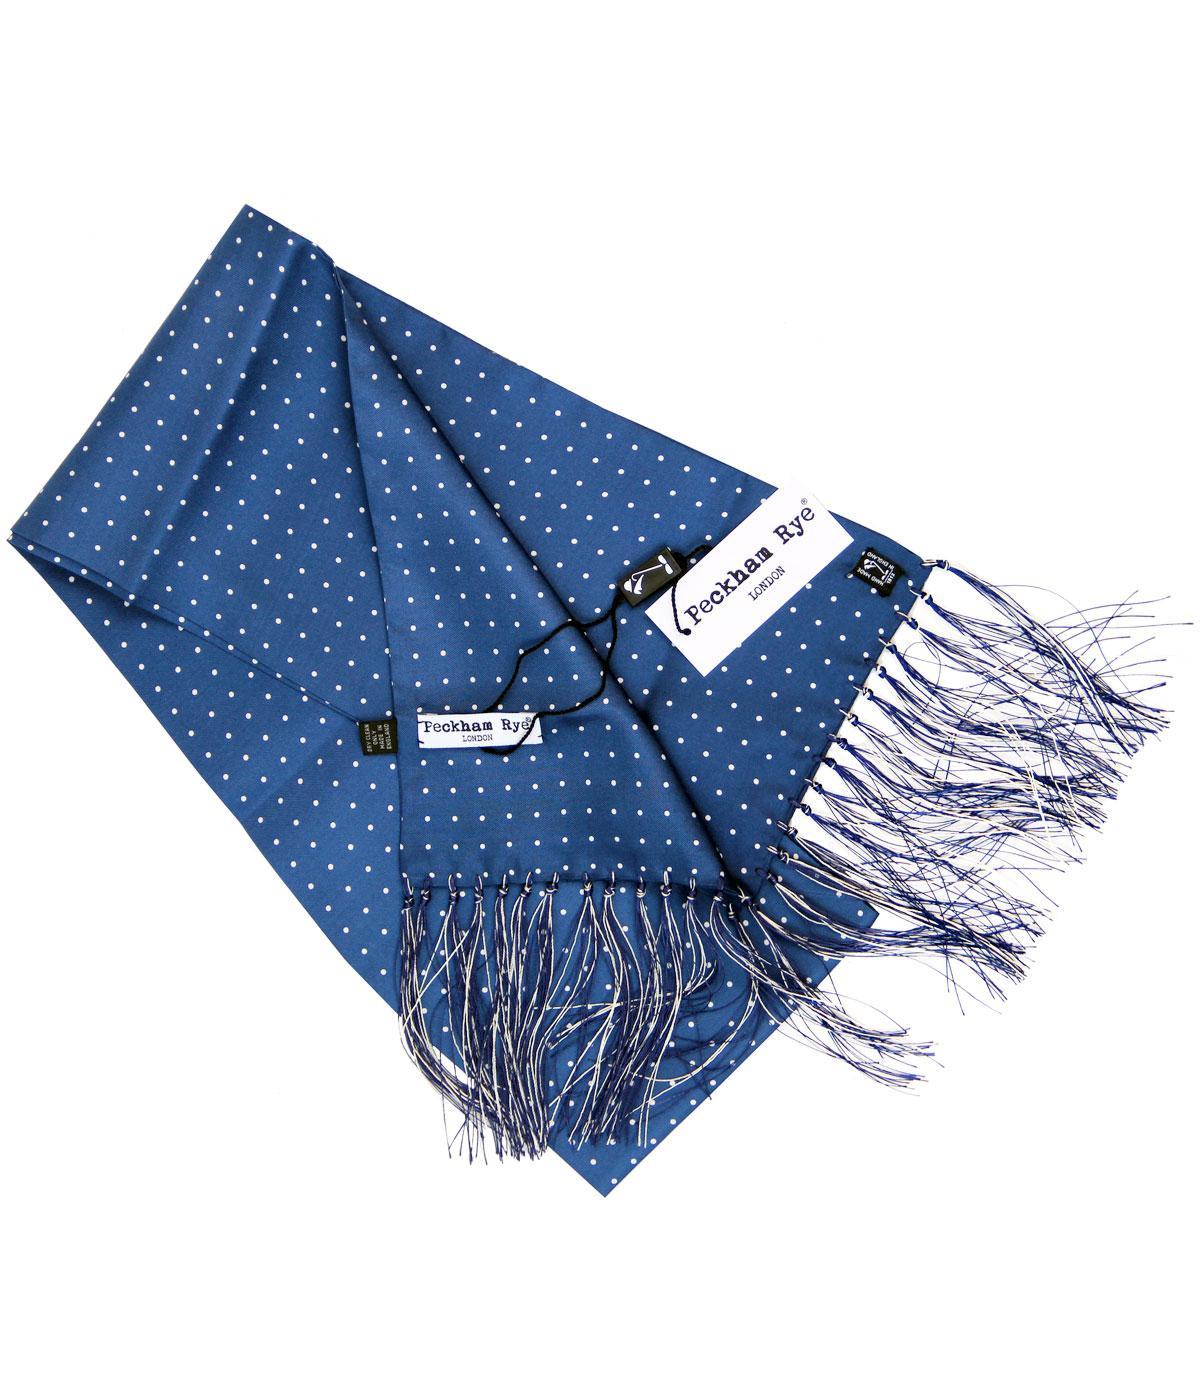 peckham rye spot retro 60s mod silk scarf blue and